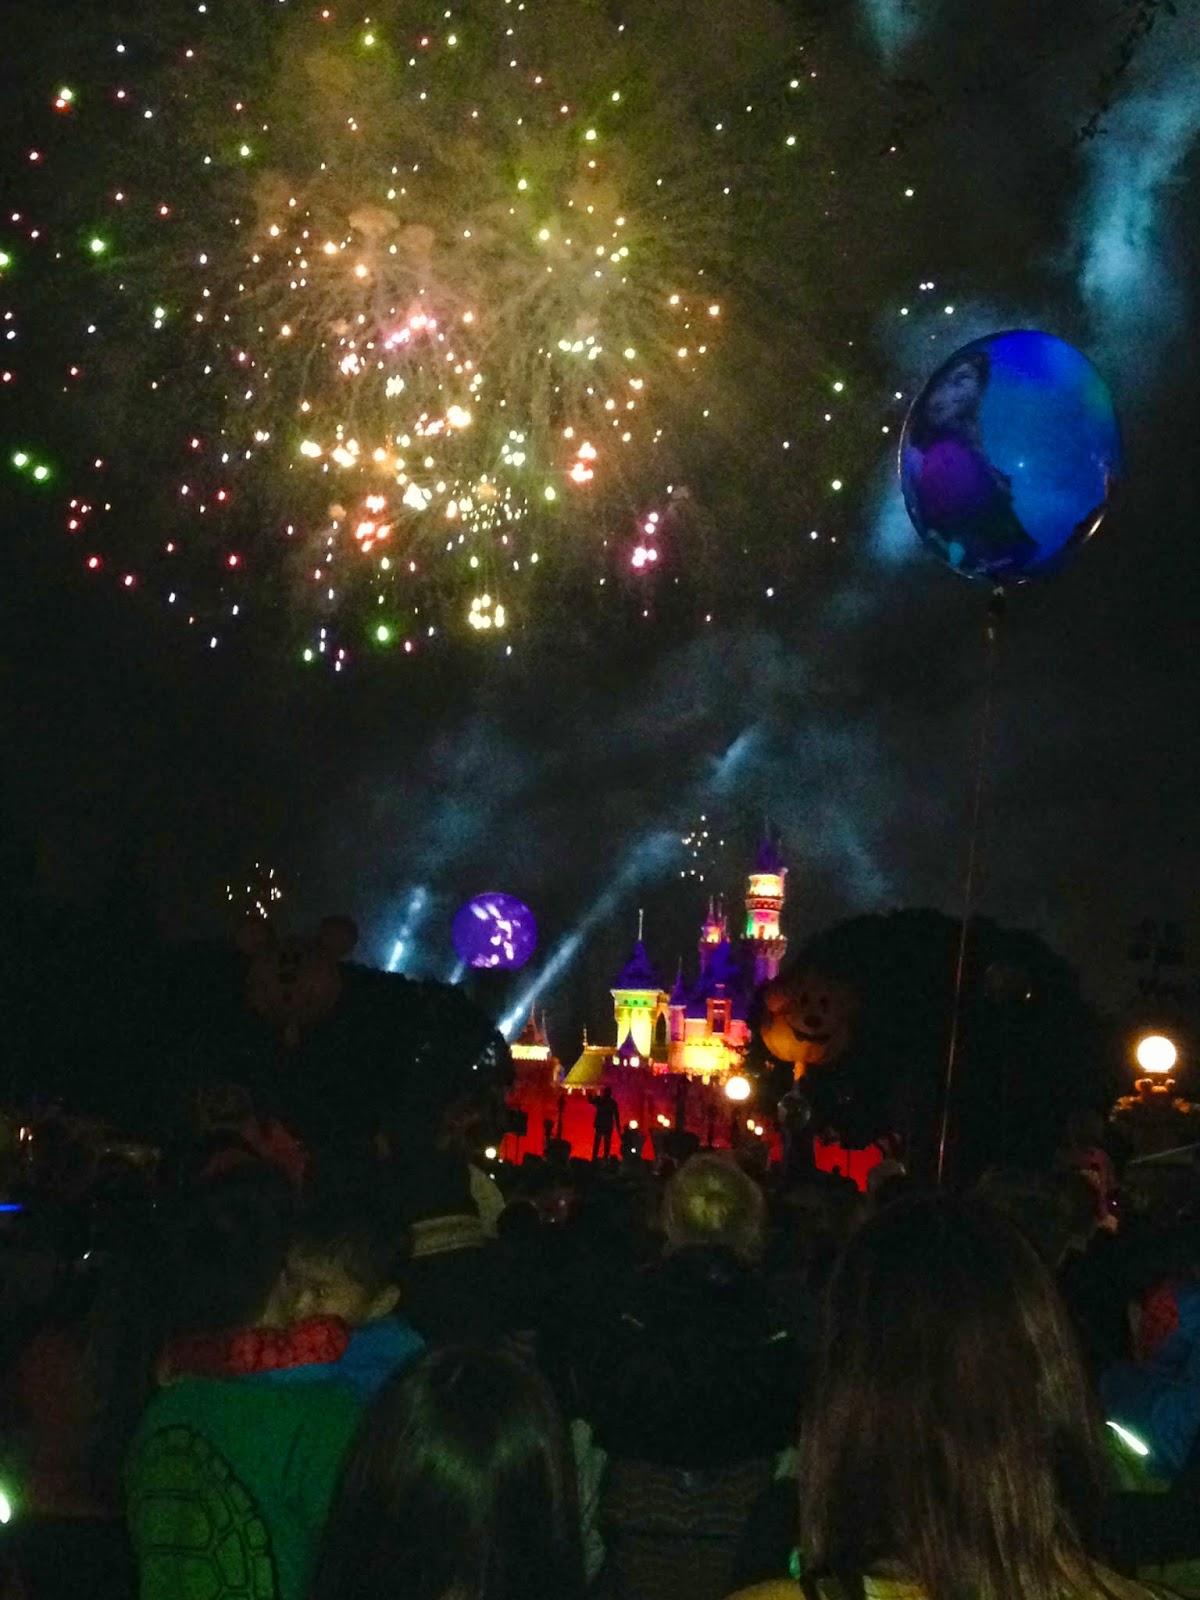 Anaheim Castle House Blog: Mickey's Halloween Party at Disneyland ...